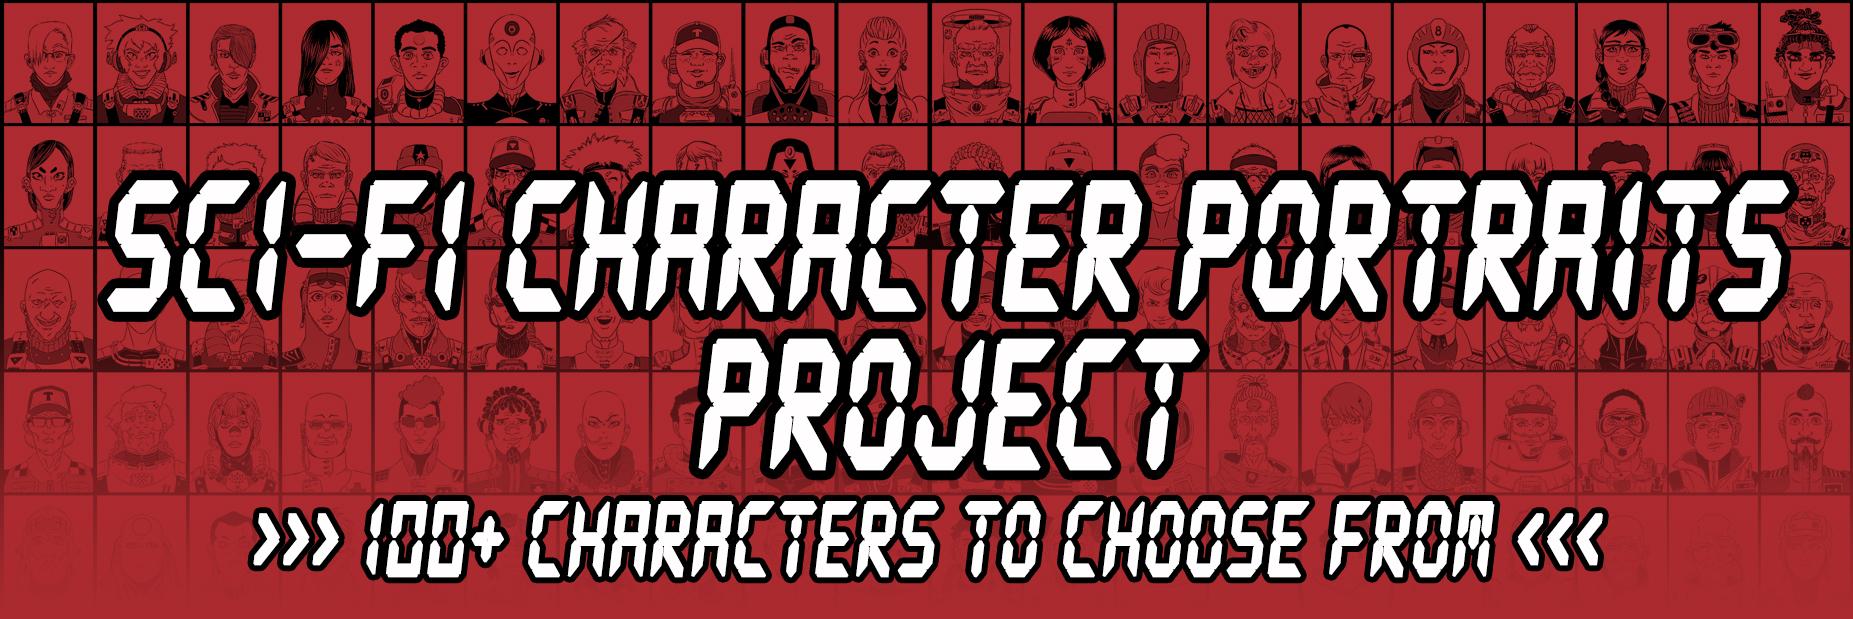 Sci-fi character portraits project